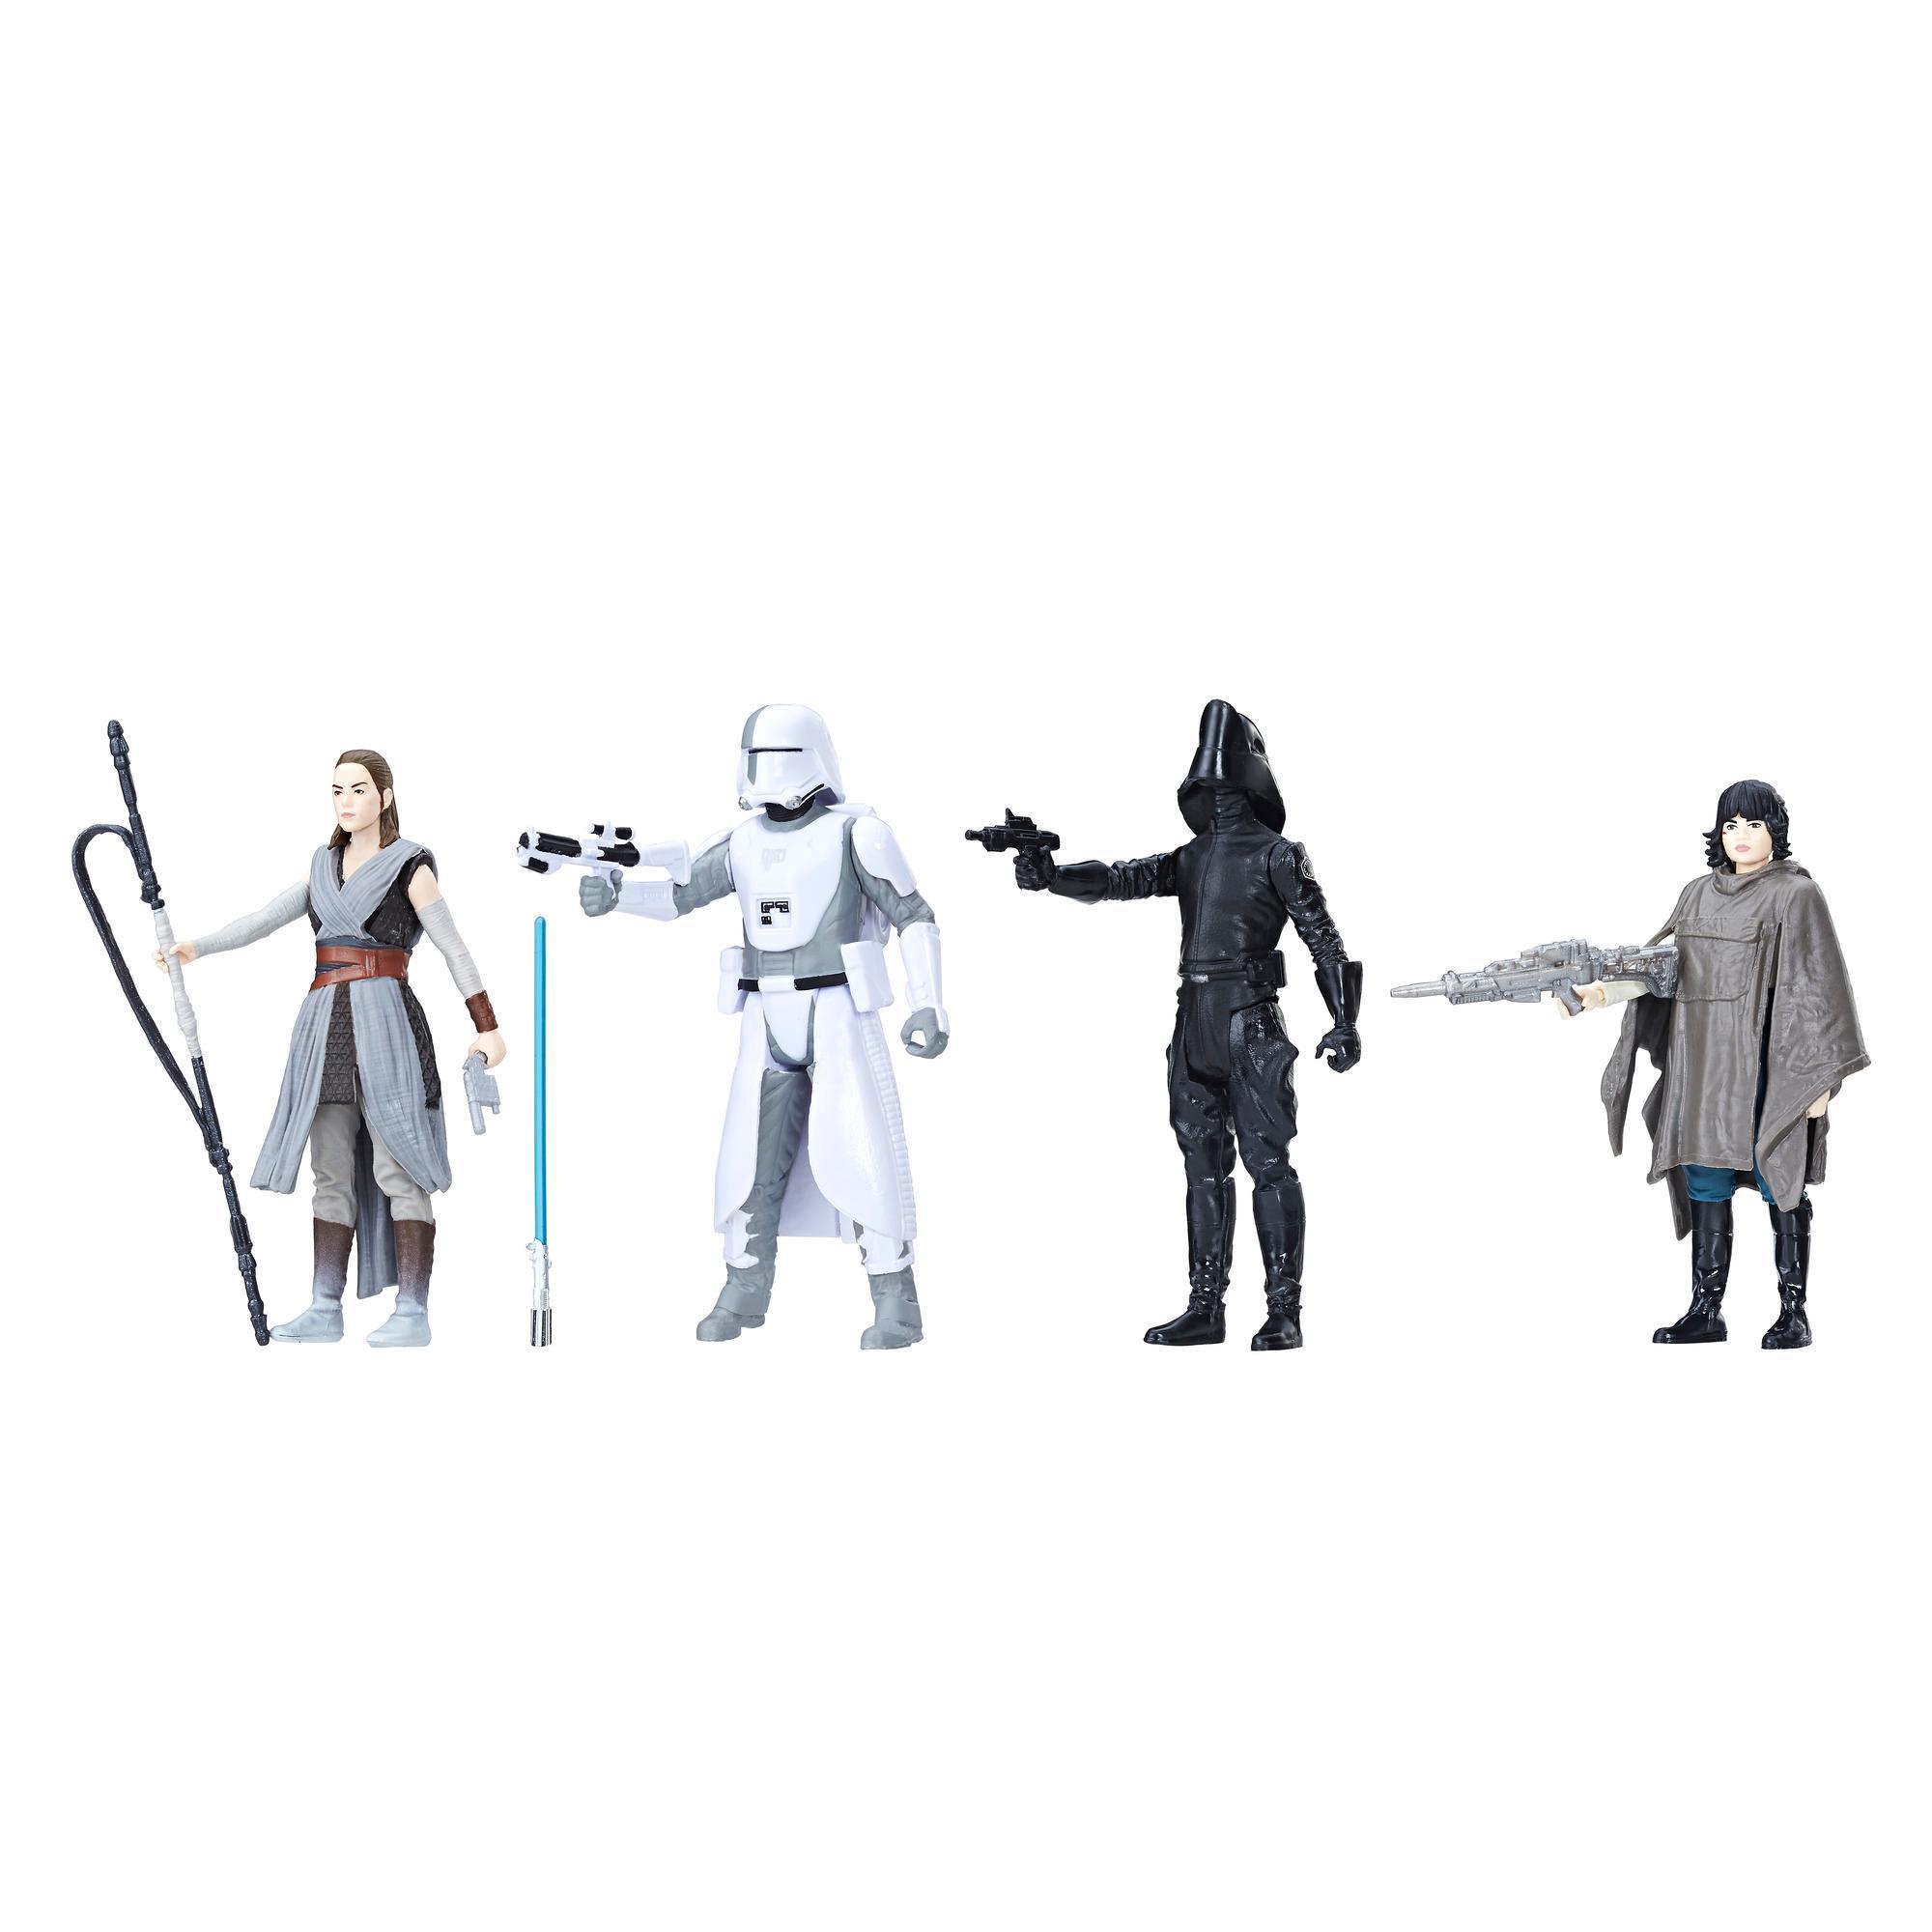 Star Wars - Battaglia di Crait (Force Link, Pack da 4 Personaggi)